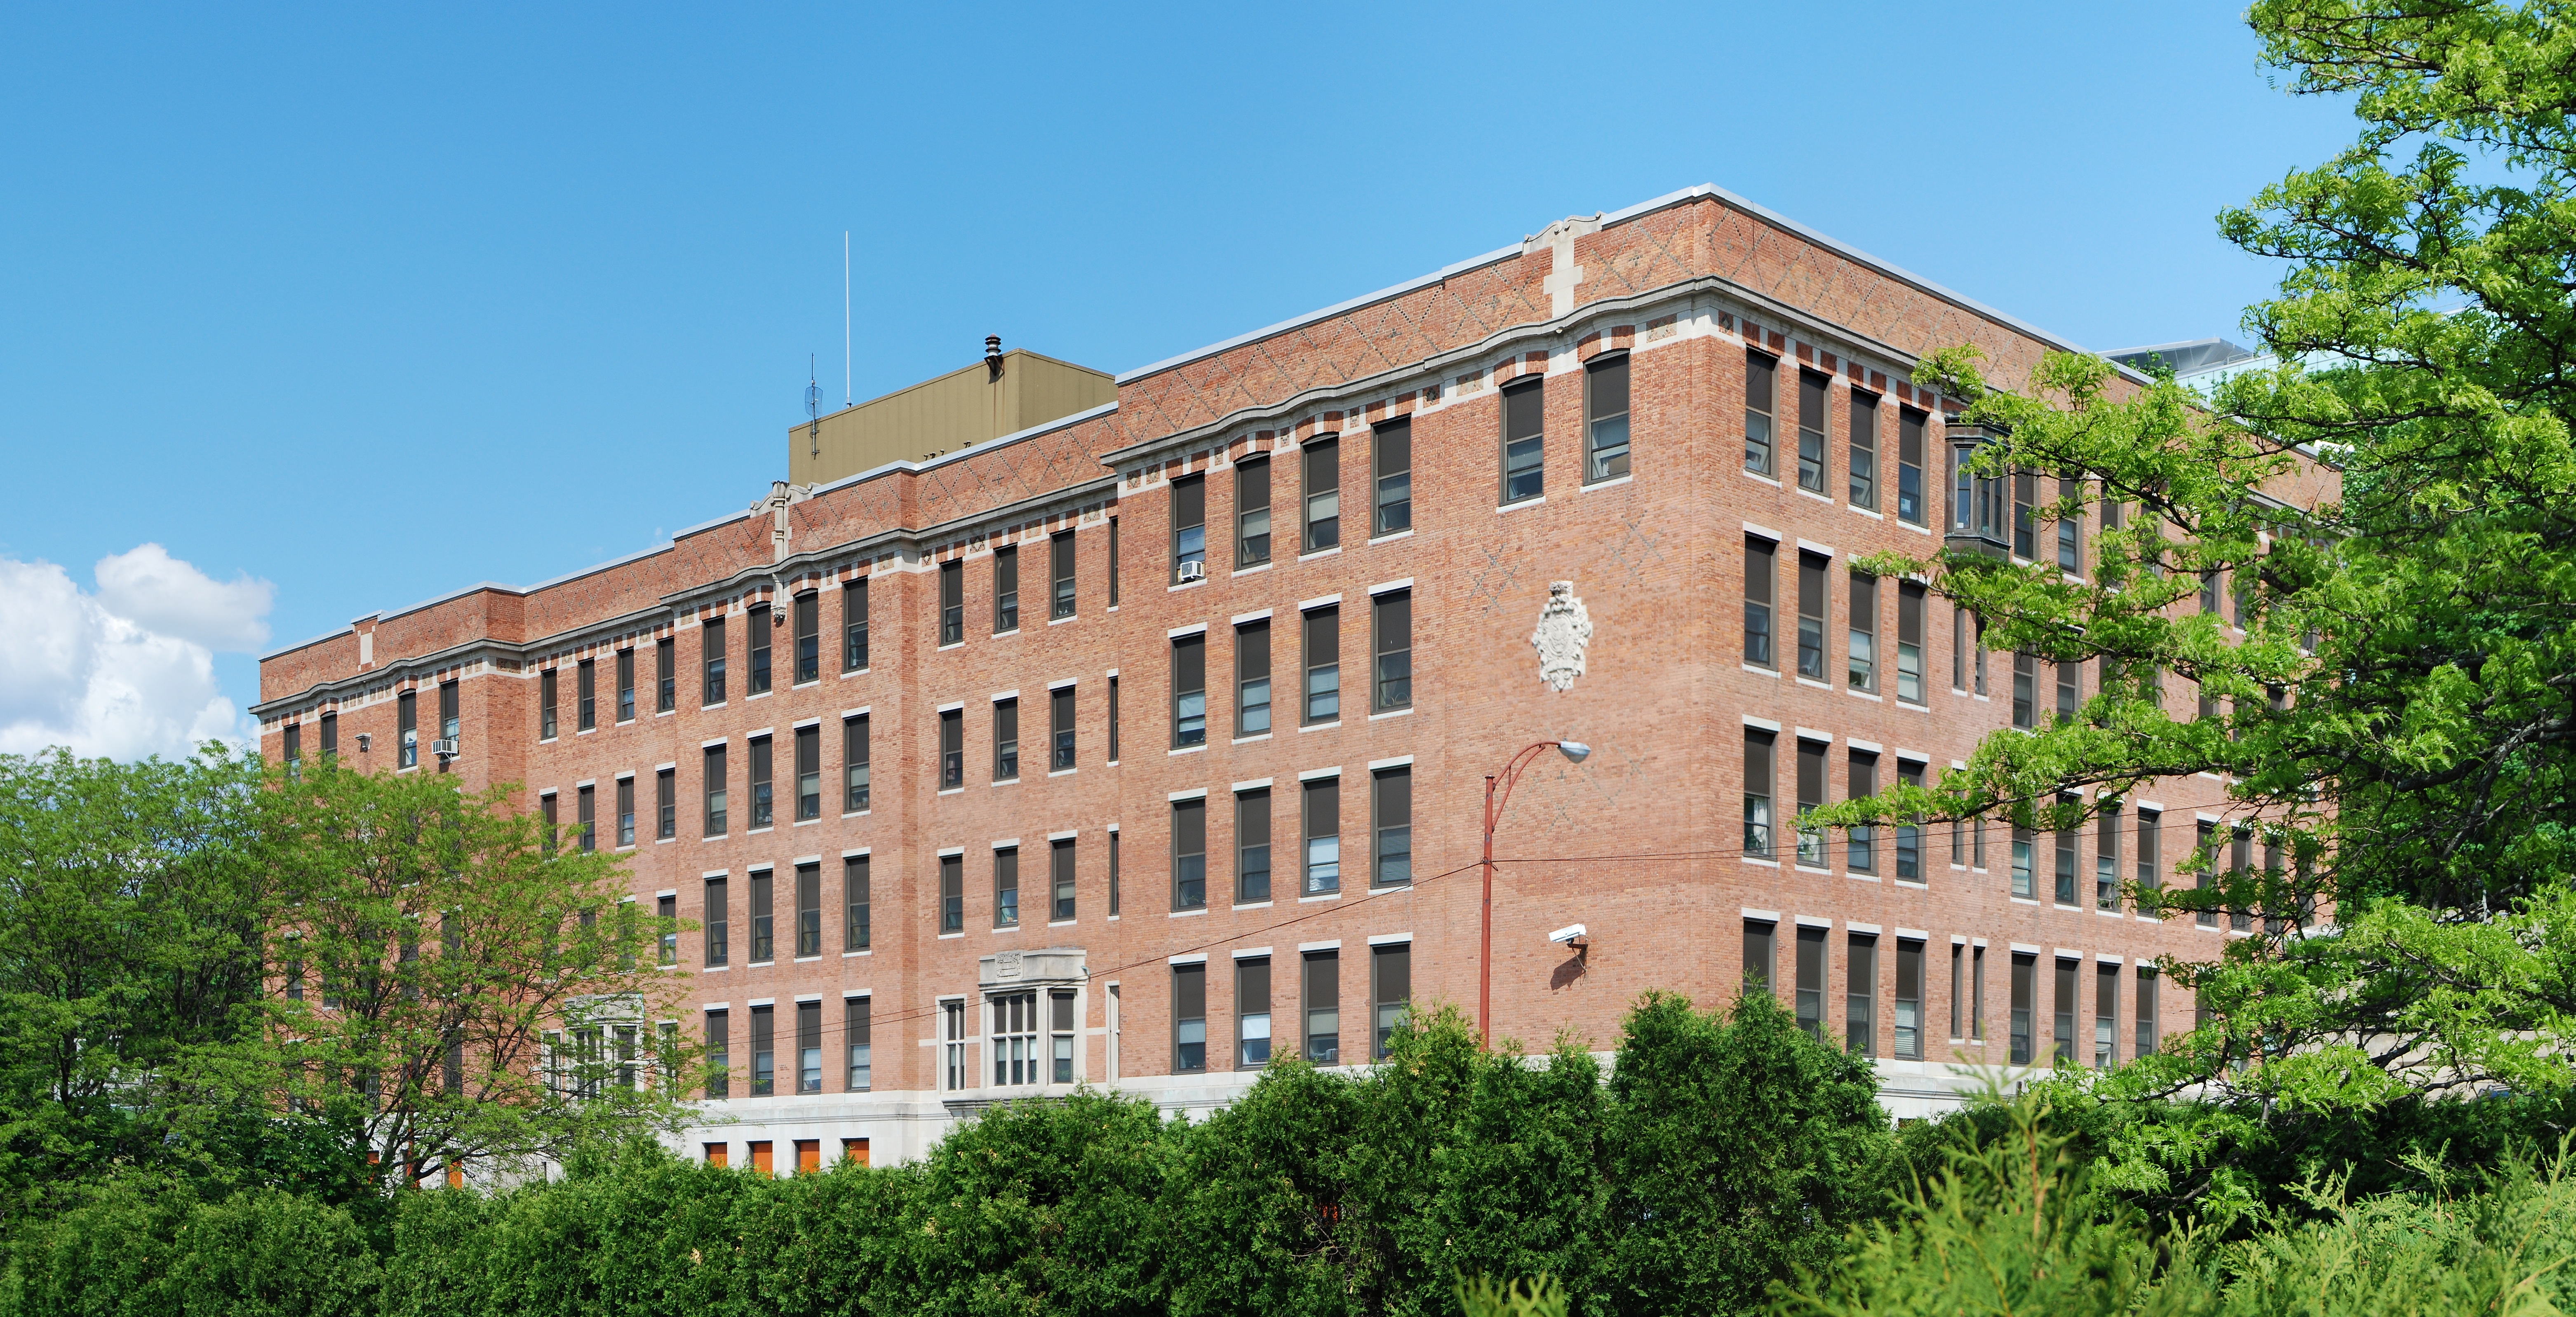 Rensselaer County Office Building